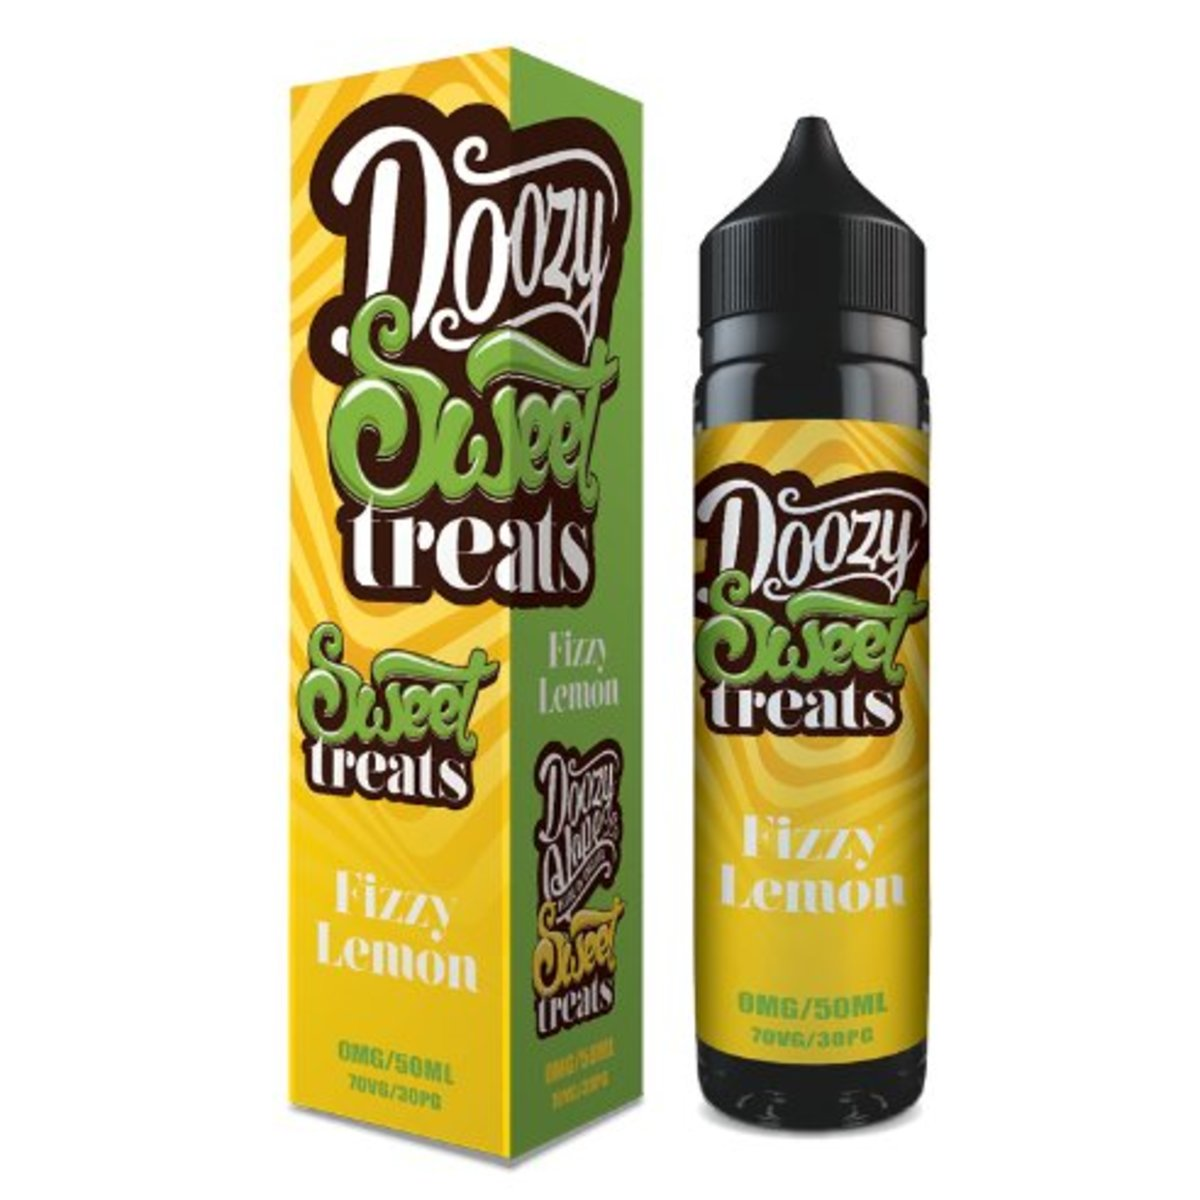 Doozy Vape Fizzy Lemon E-Liquid Shortfill | Electronic Cigarette Co